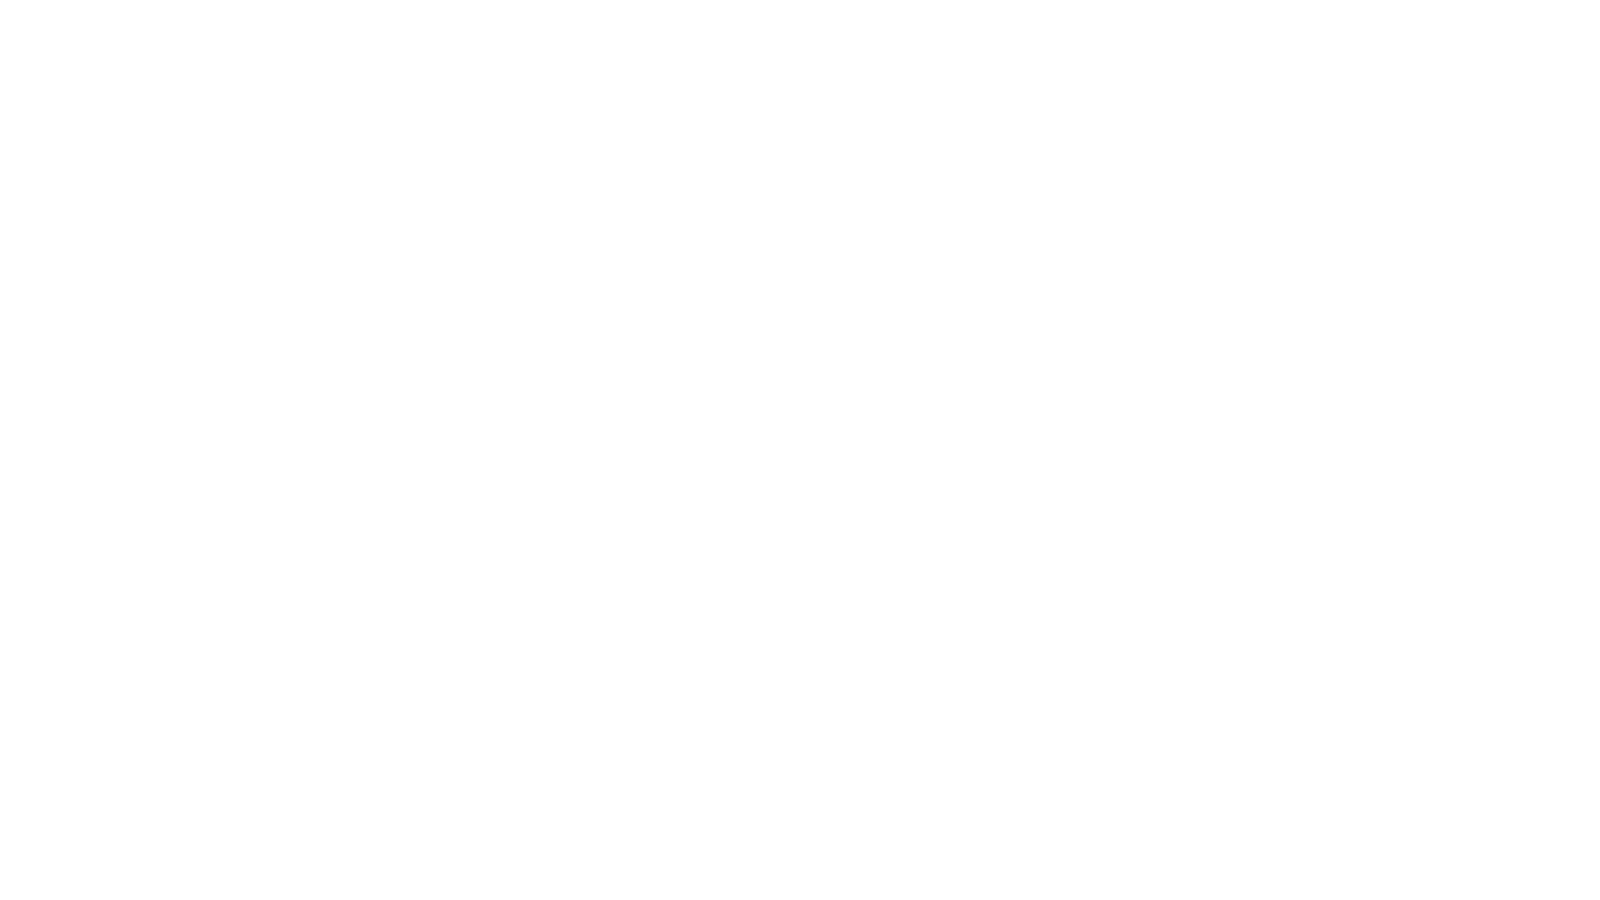 Music and video by Erik van Os, 2021 https://www.erikvanos.com